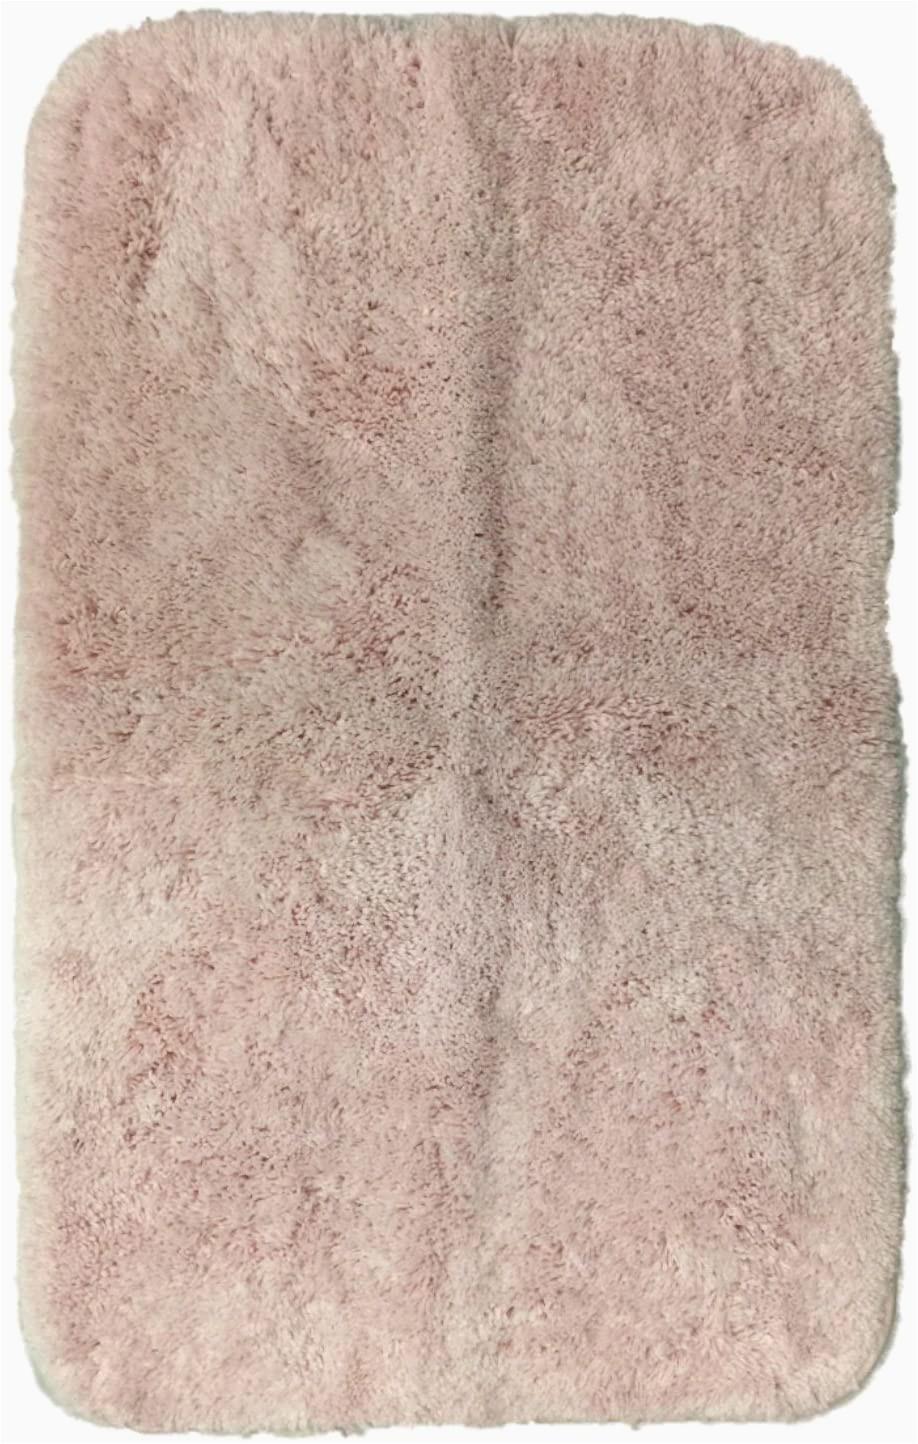 Plush Pink Bathroom Rugs Amazon sonoma Ultimate Light Blush Pink Skid Resistant